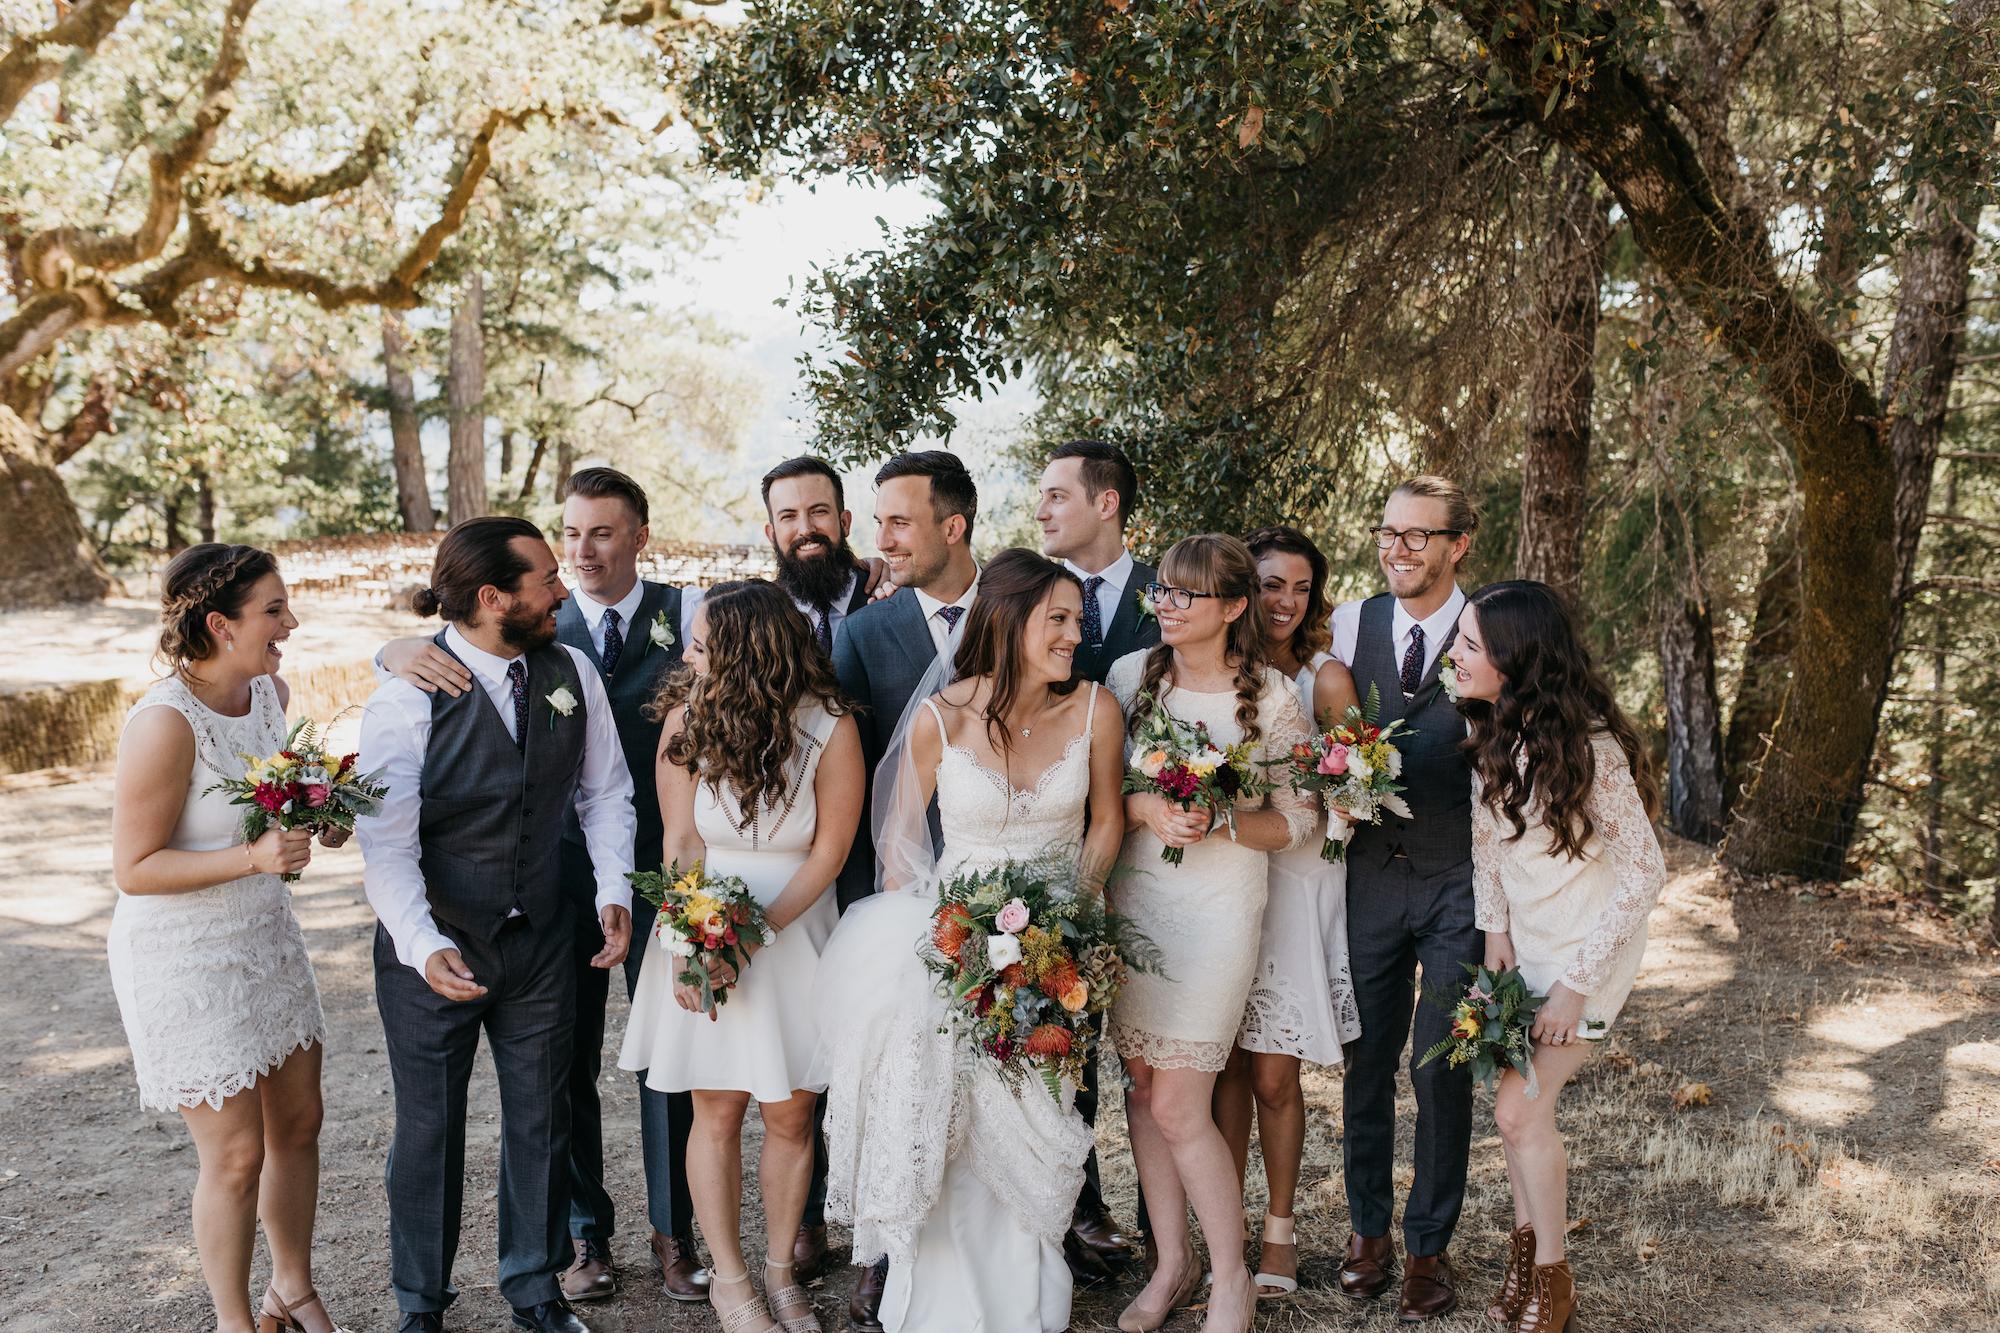 anvil-vineyards-wedding-photographer297.jpg